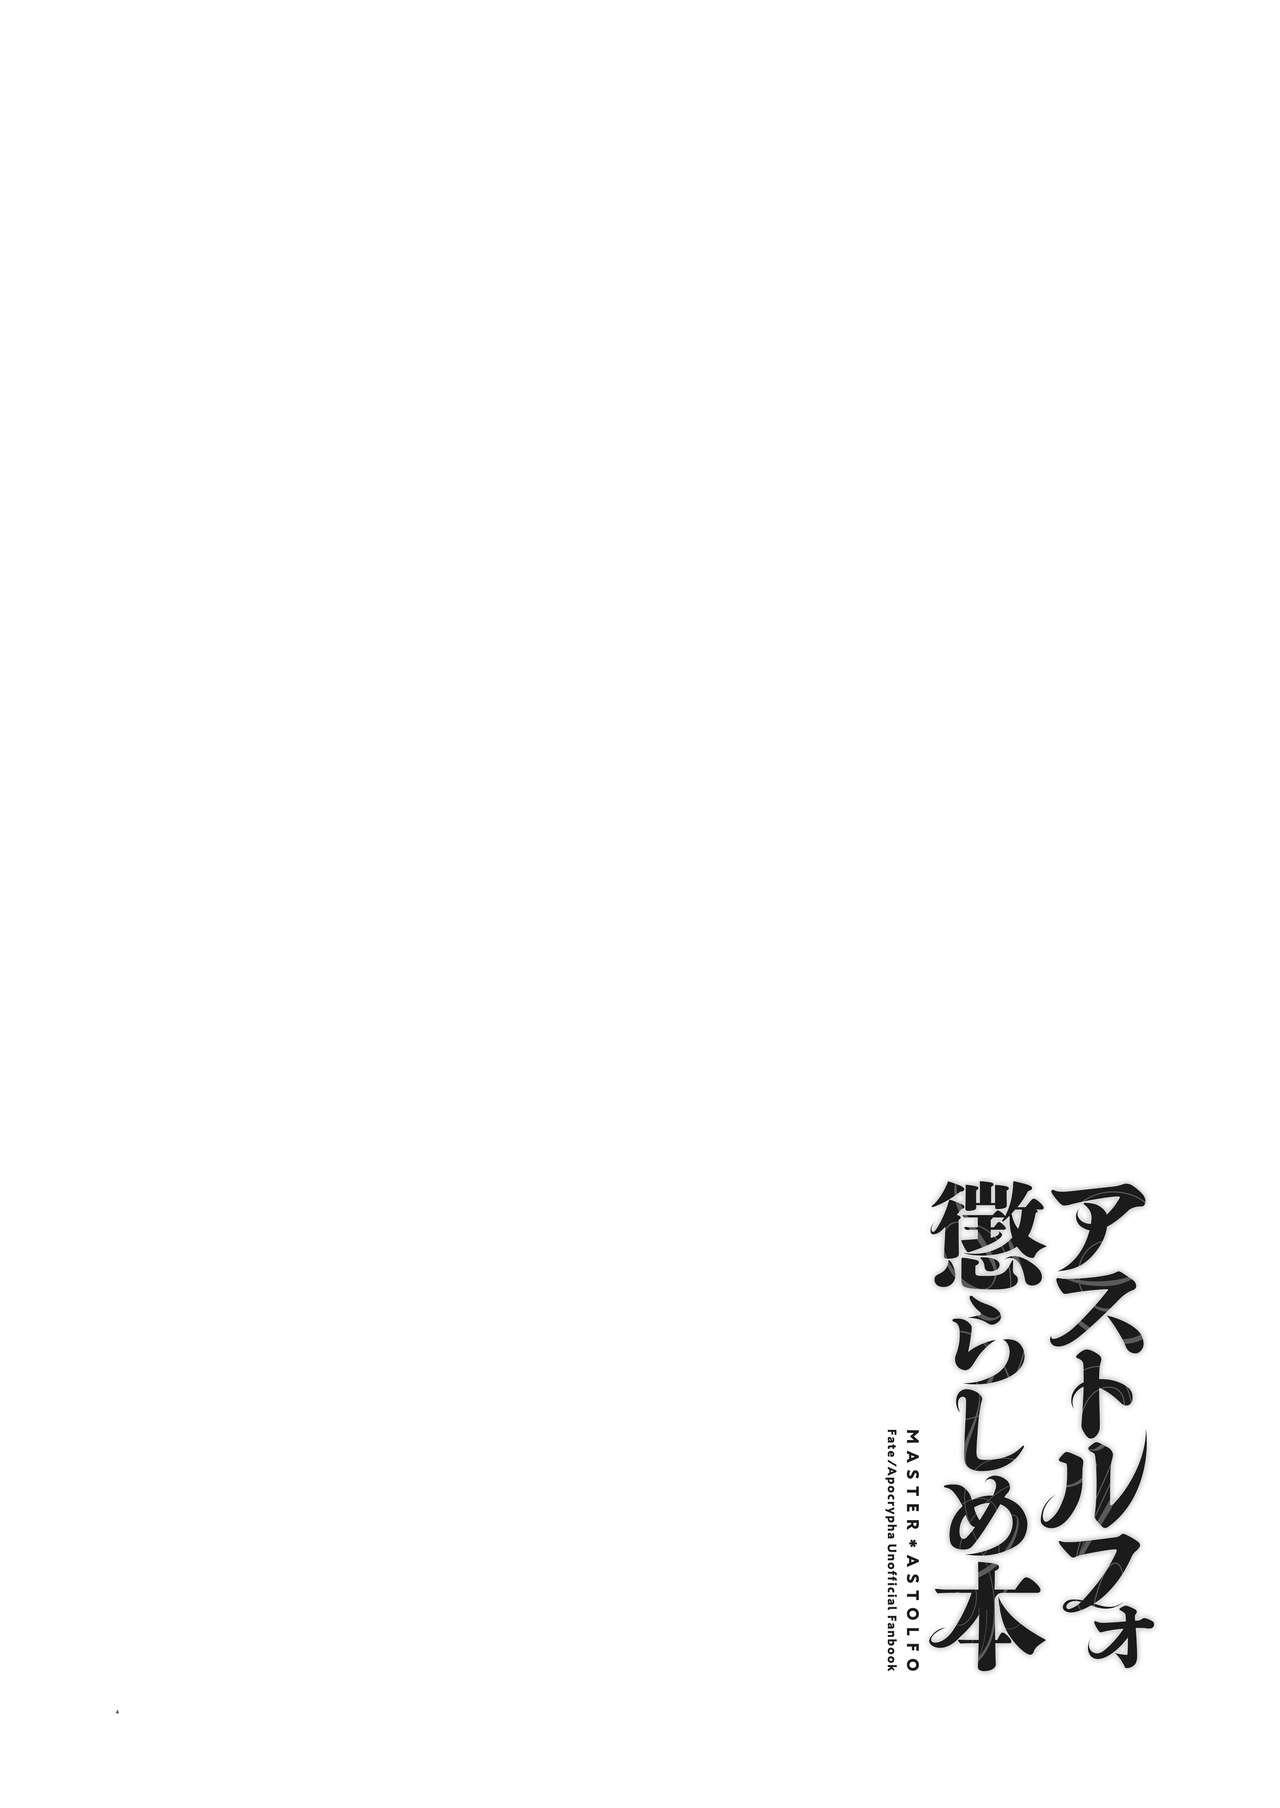 Astolfo Korashime Hon | Teasing Astolfo 2